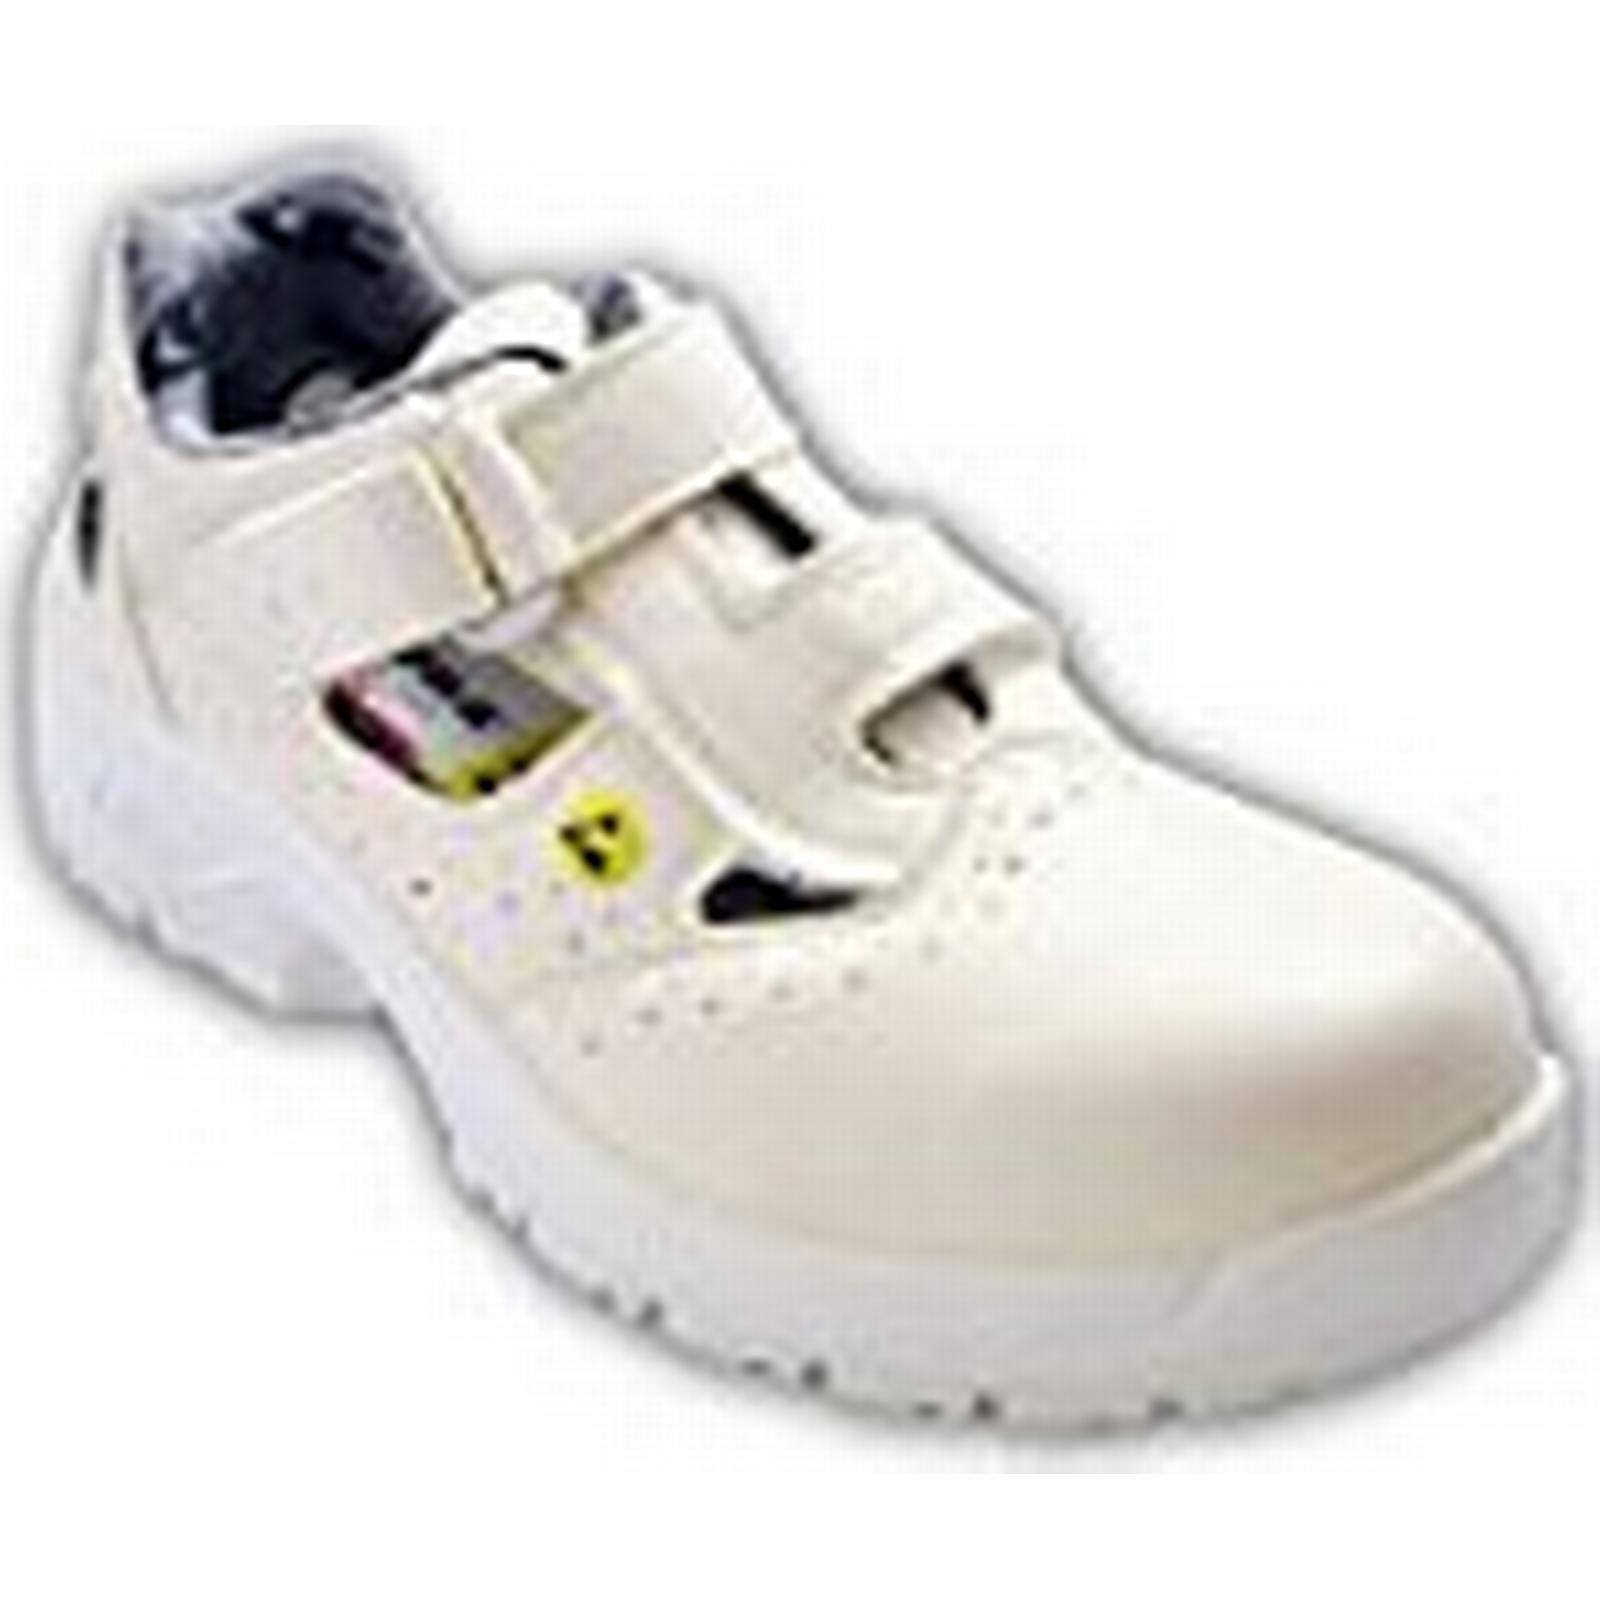 Cofra Specials S.r.l. Cofra Safety Sandals Specials Cofra 10190 000 Servius S1 ESD SRC White, 41 EU, Weiß efa1d3